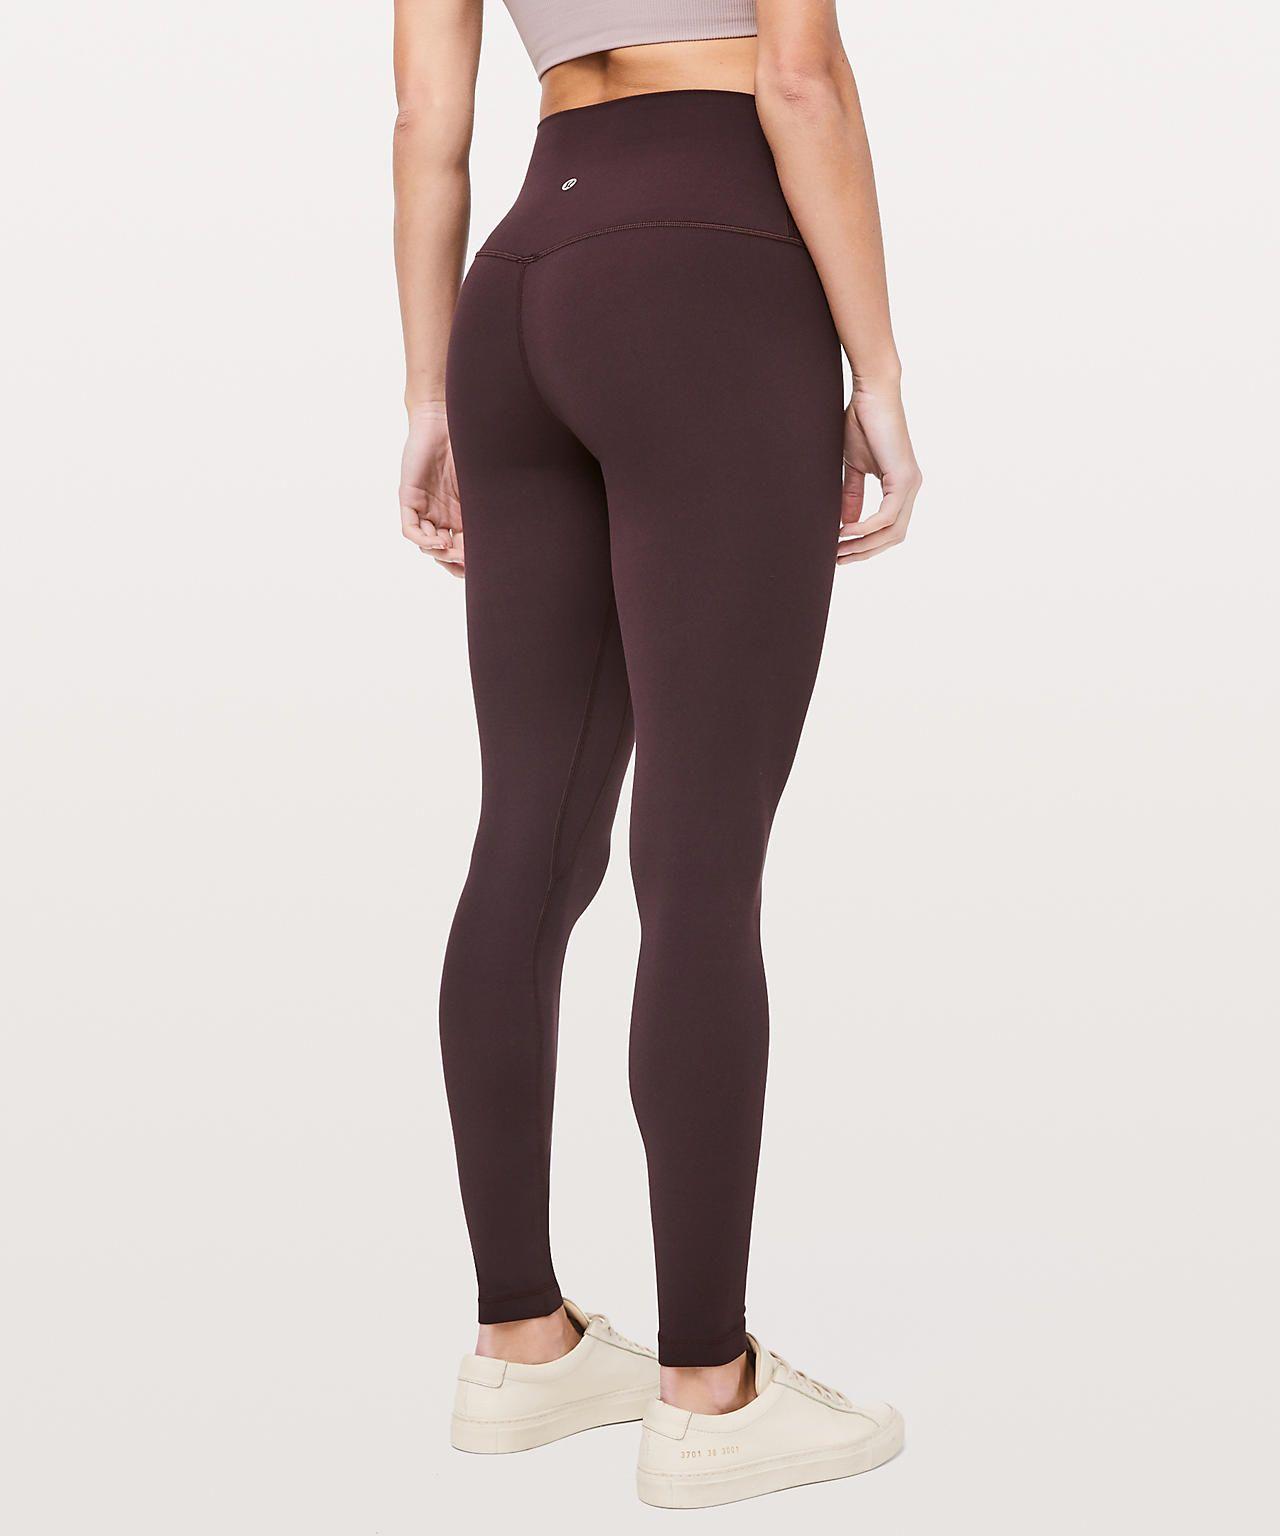 "Align Pant 28"" Women's Pants in 2020 Pants for women"